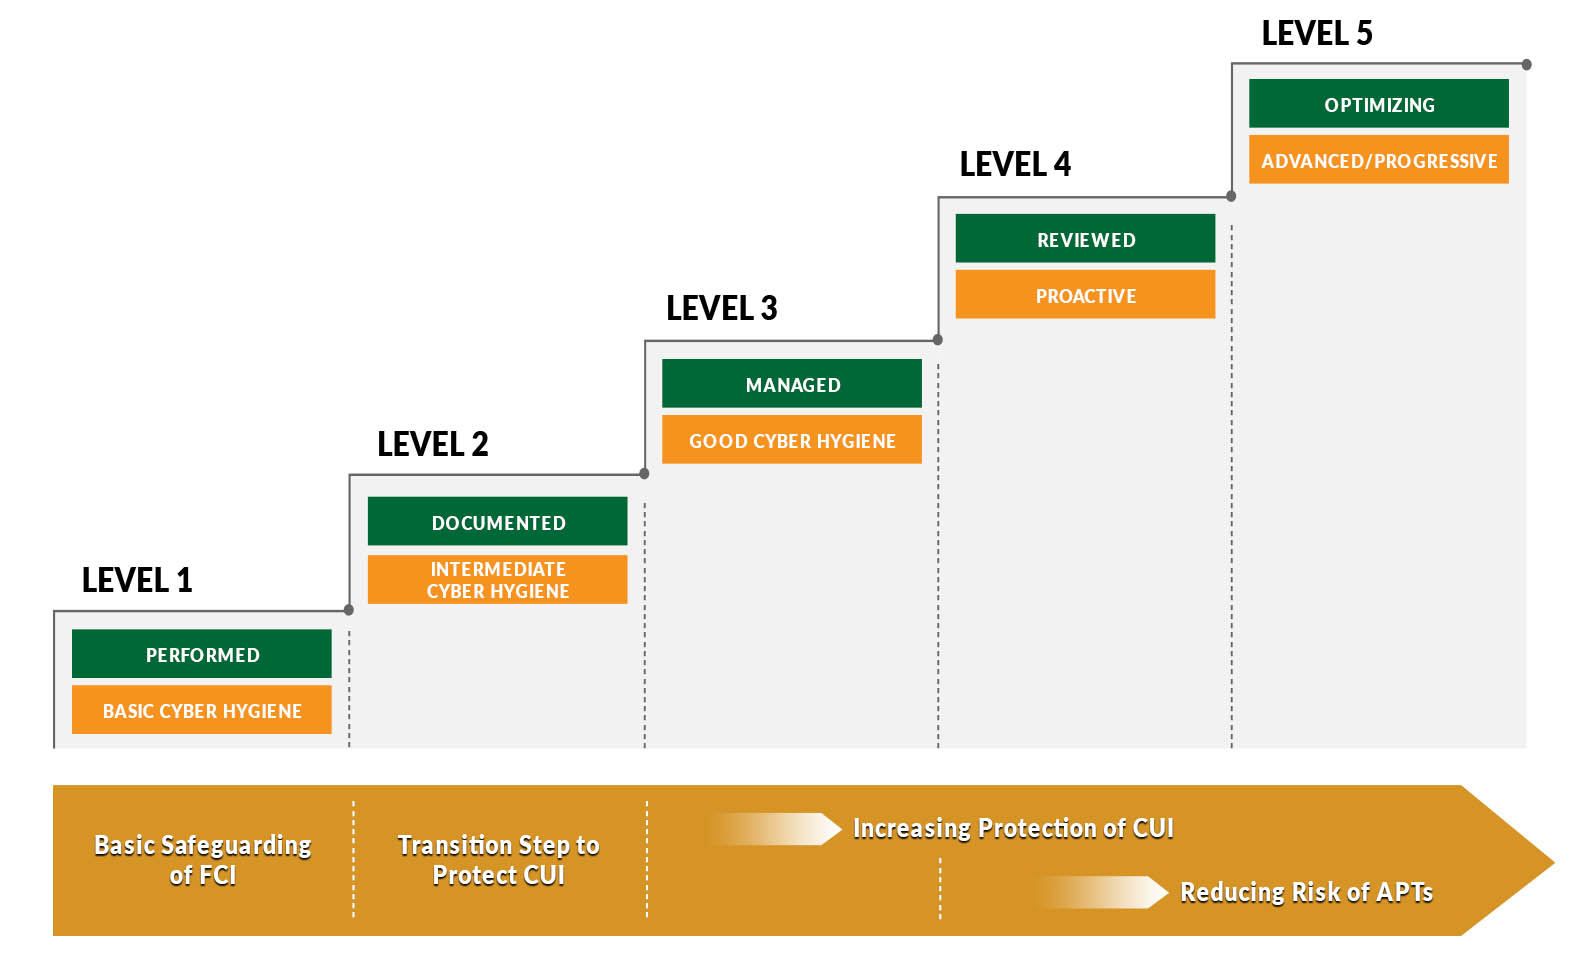 CMMC Levels and Associated Focus Chart